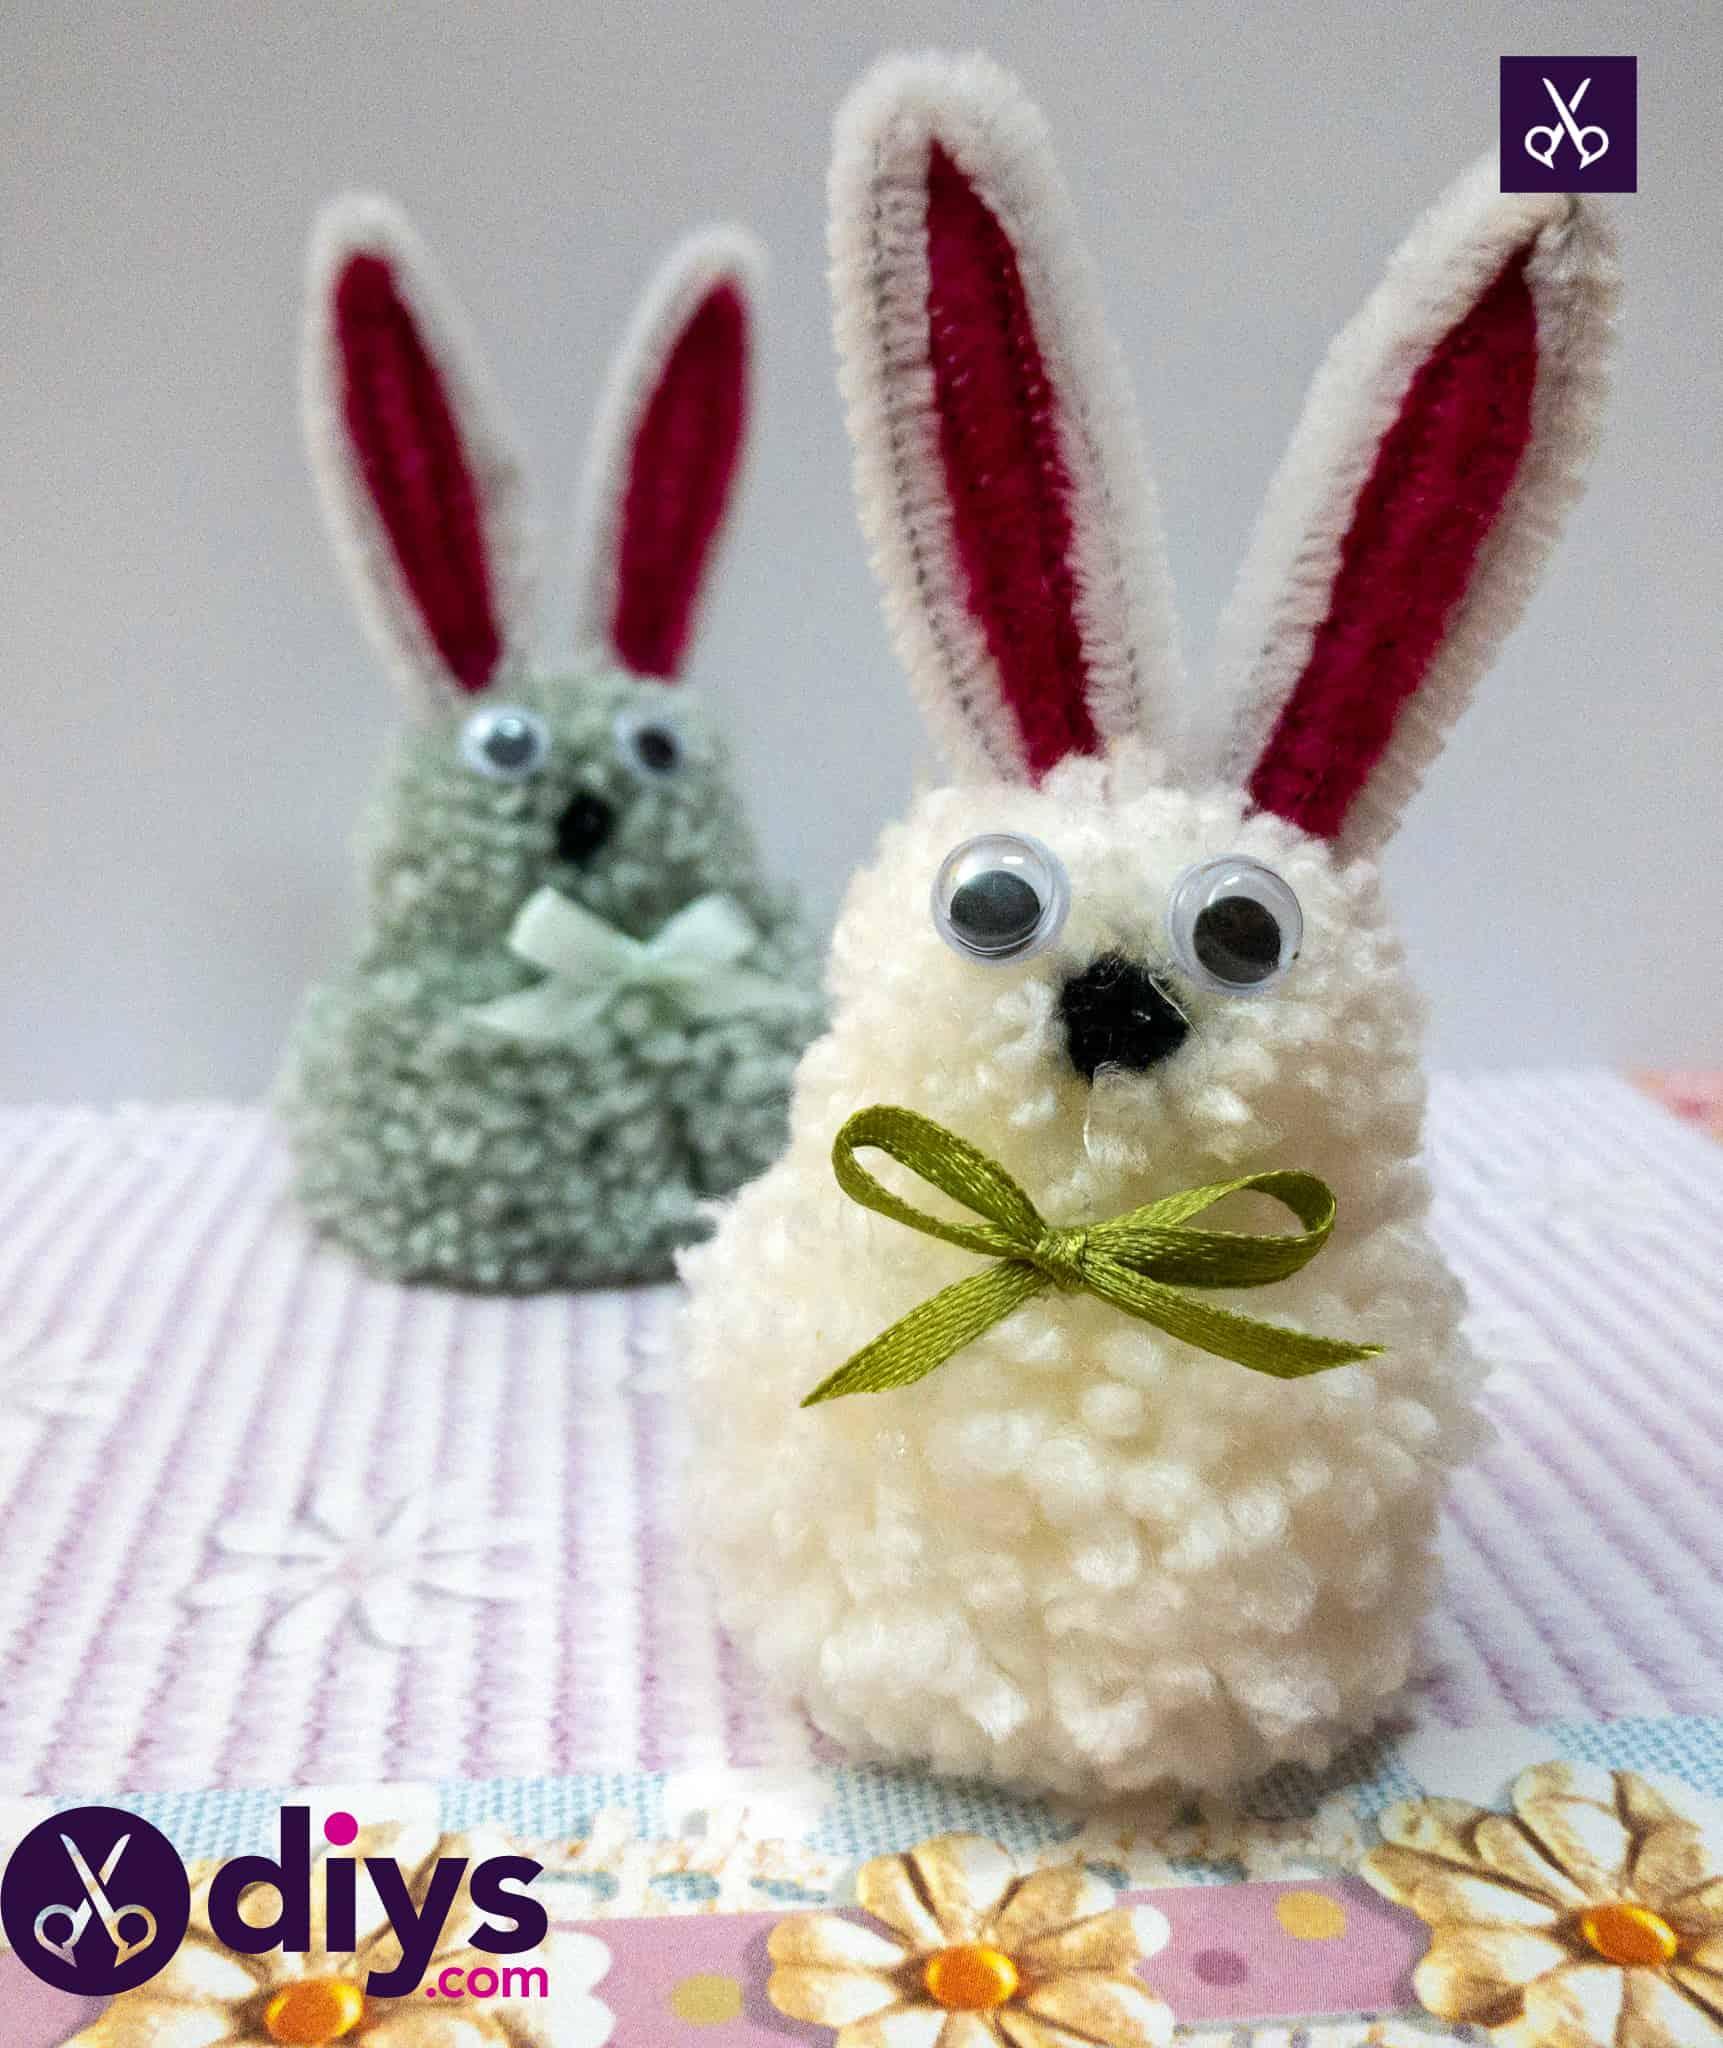 How to make a pom pom rabbit for easter